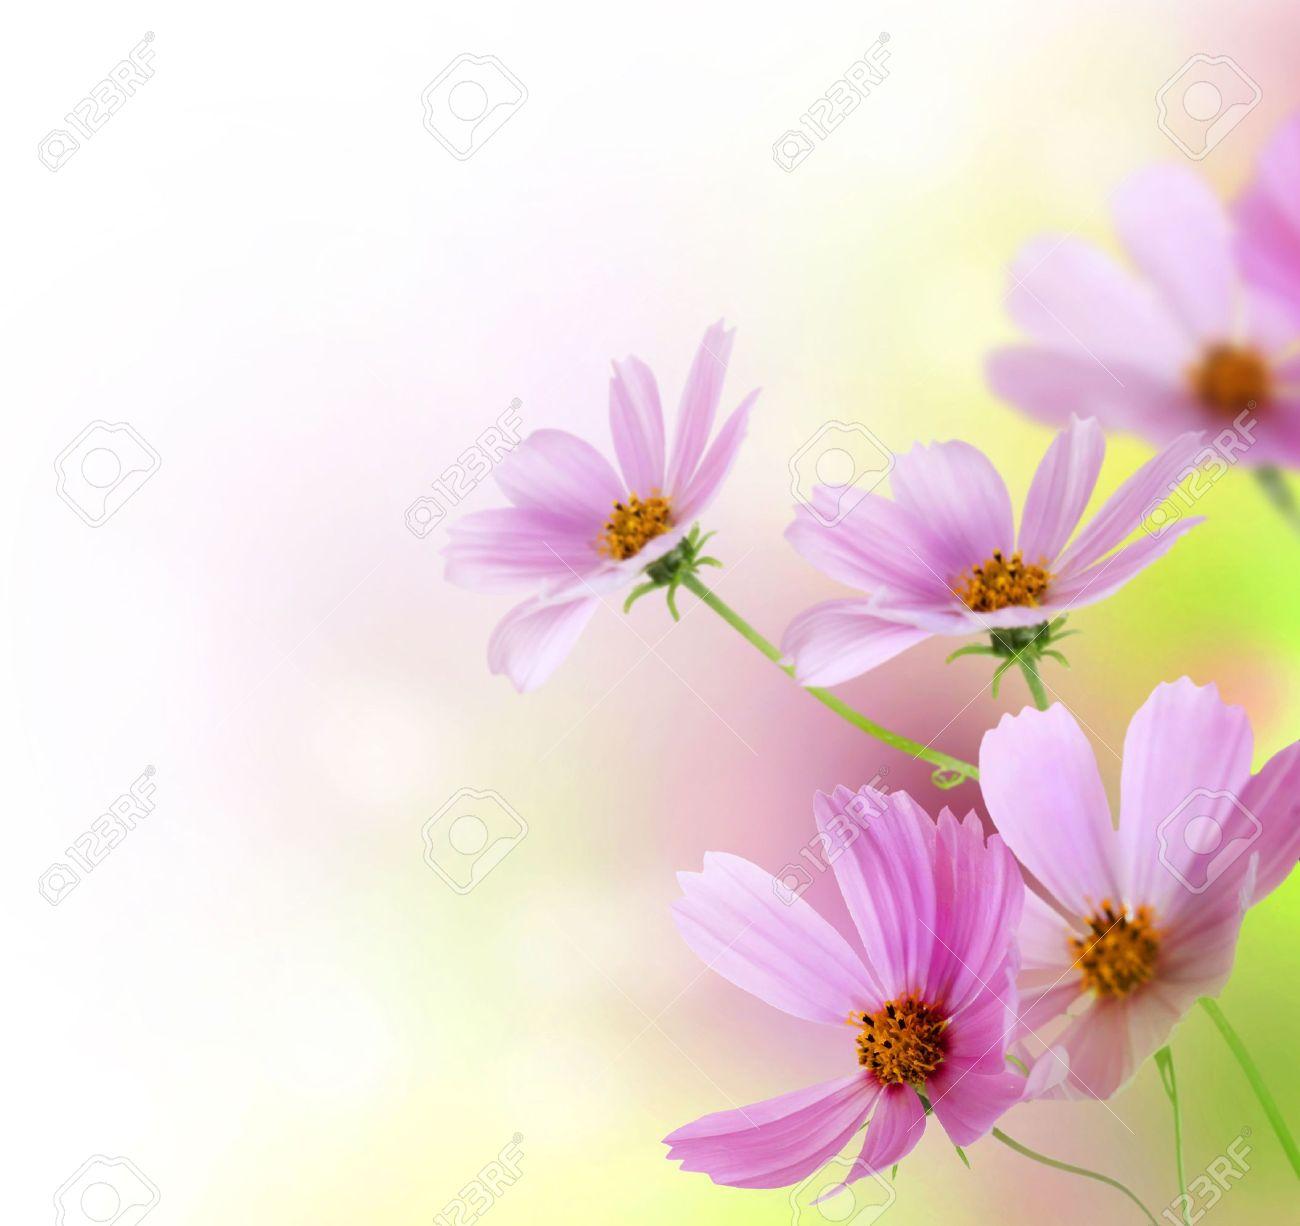 Beautiful Floral Border.Flower design Stock Photo - 7815201